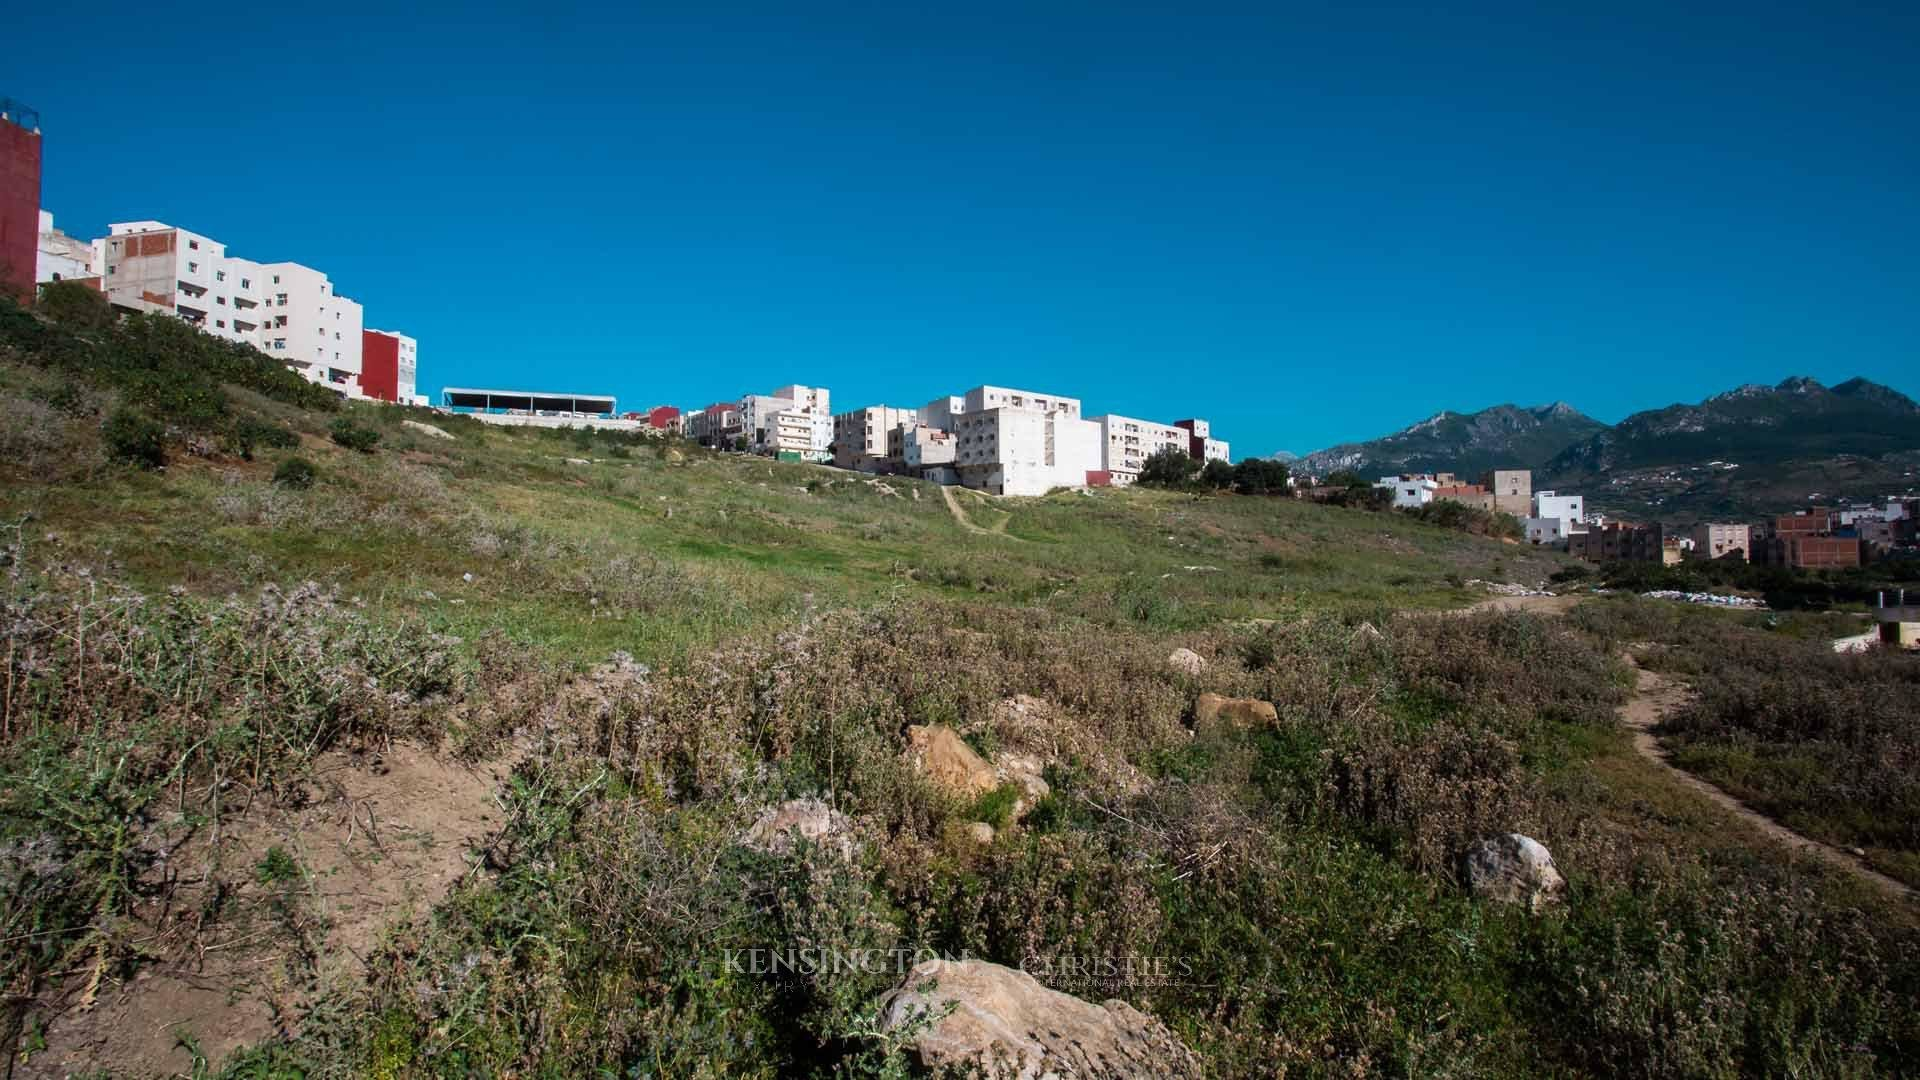 KPPM01239: Land Tetouan 3 Building land Tétouan Morocco